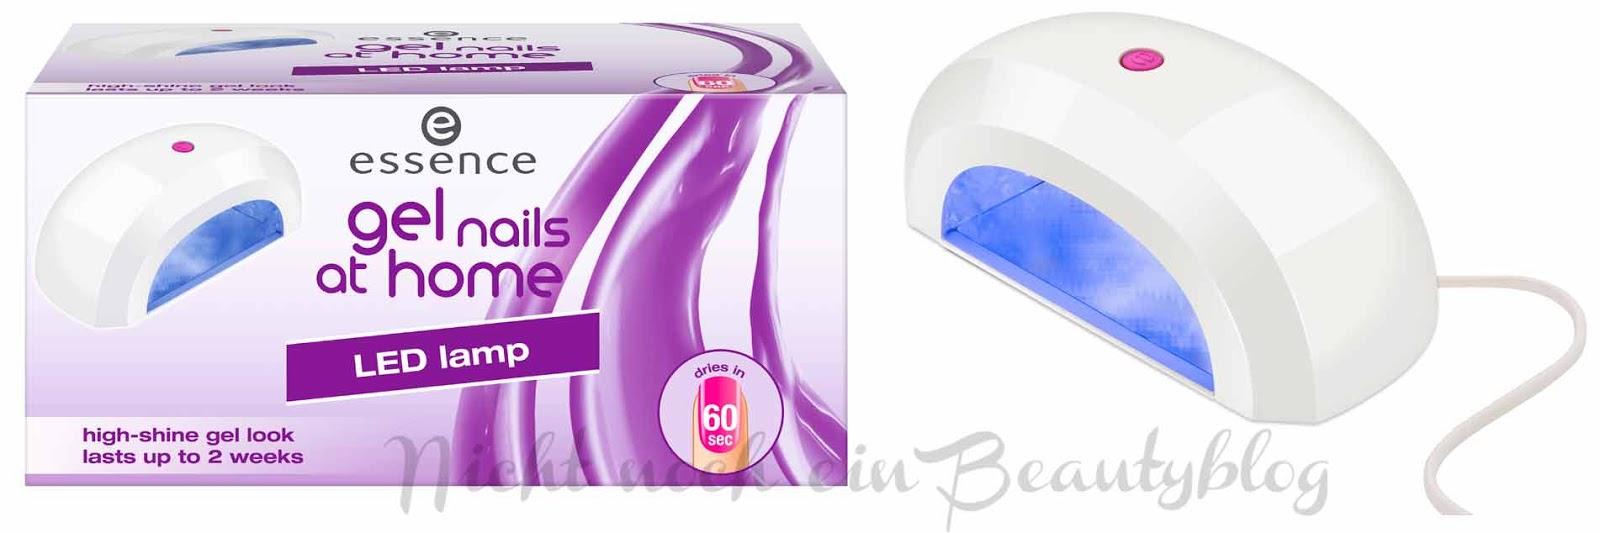 Nicht Noch Ein Beautyblog Preview Essence Gel Nails At Home